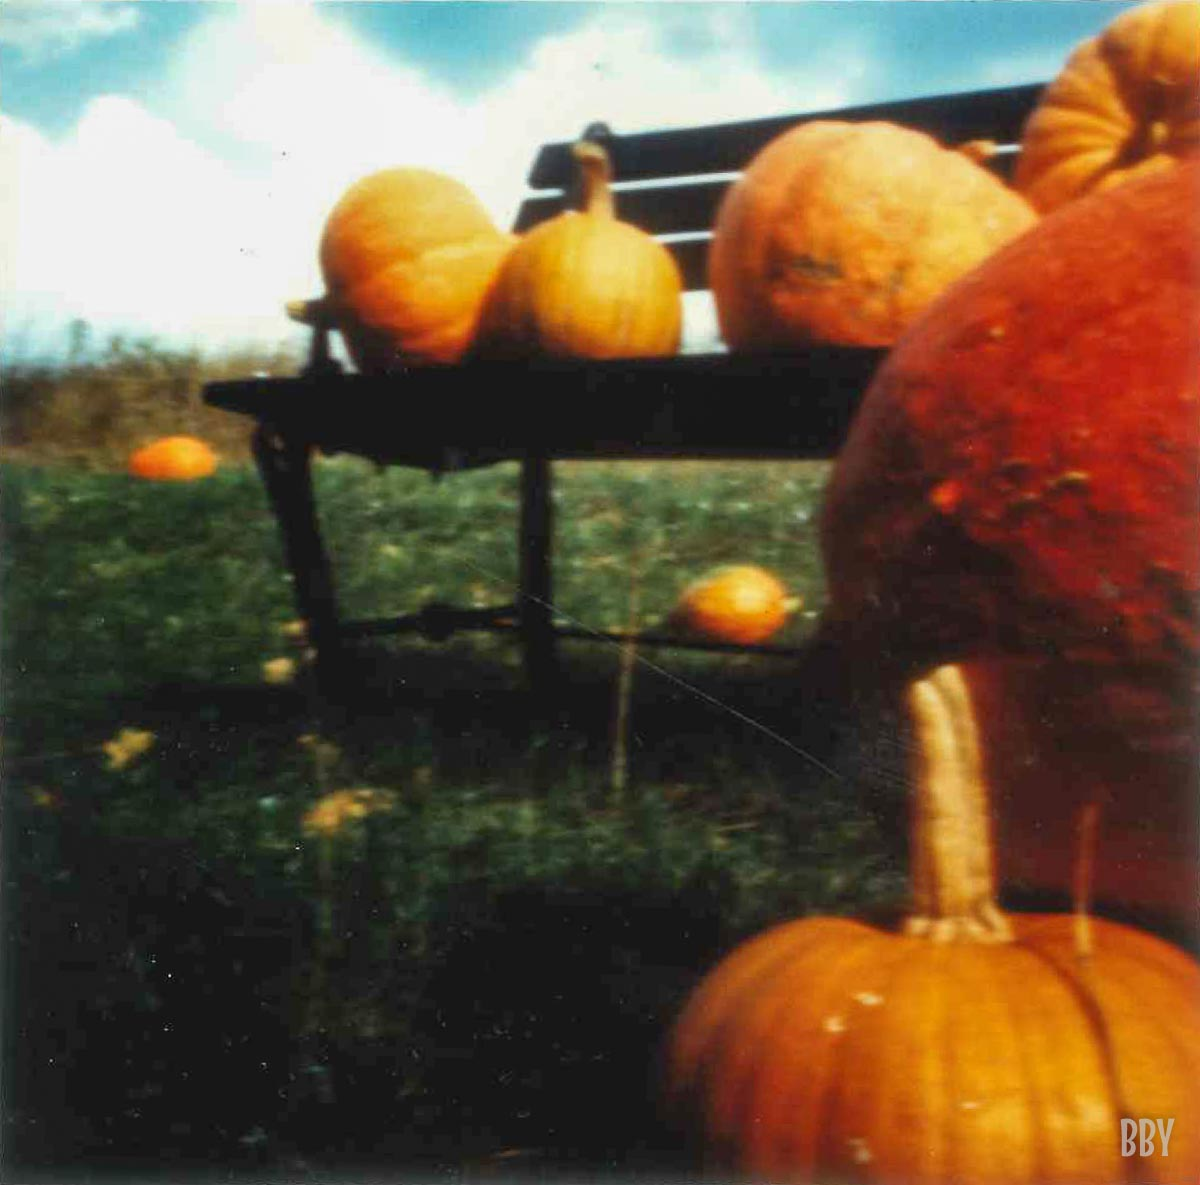 stenope, pinhole, slow photography, chambre noire, potiron, pumpkin, orange